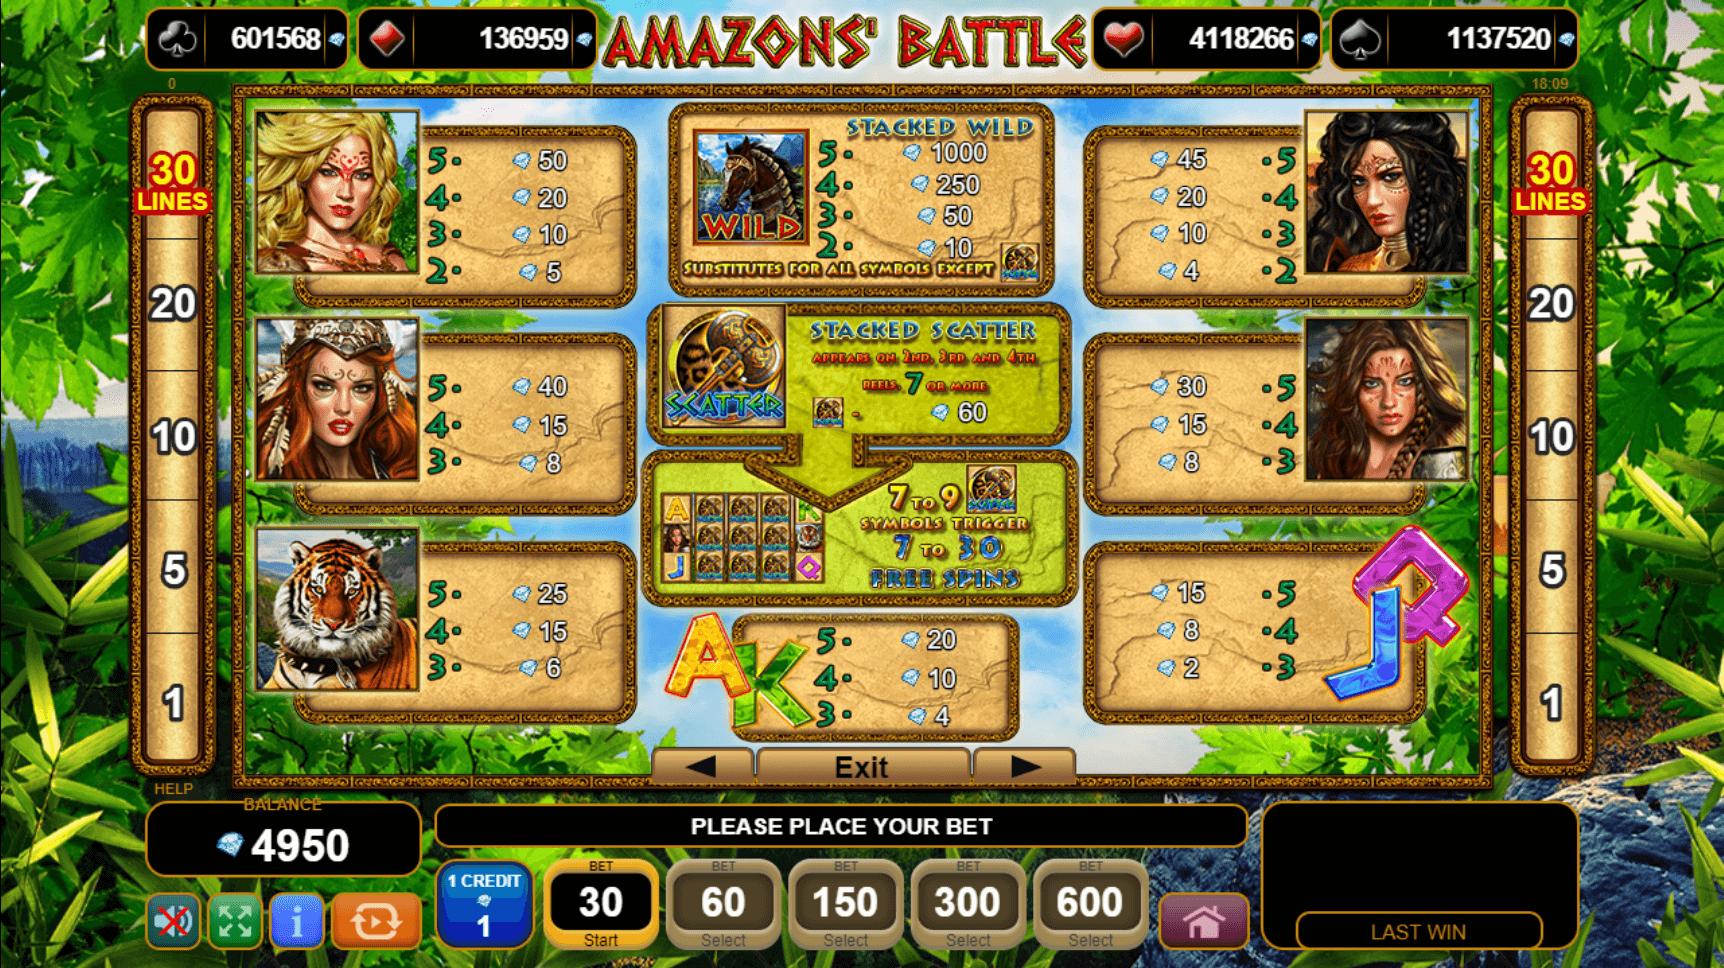 Auction rtp battle slots play free battlethemed slot machine games deluxe